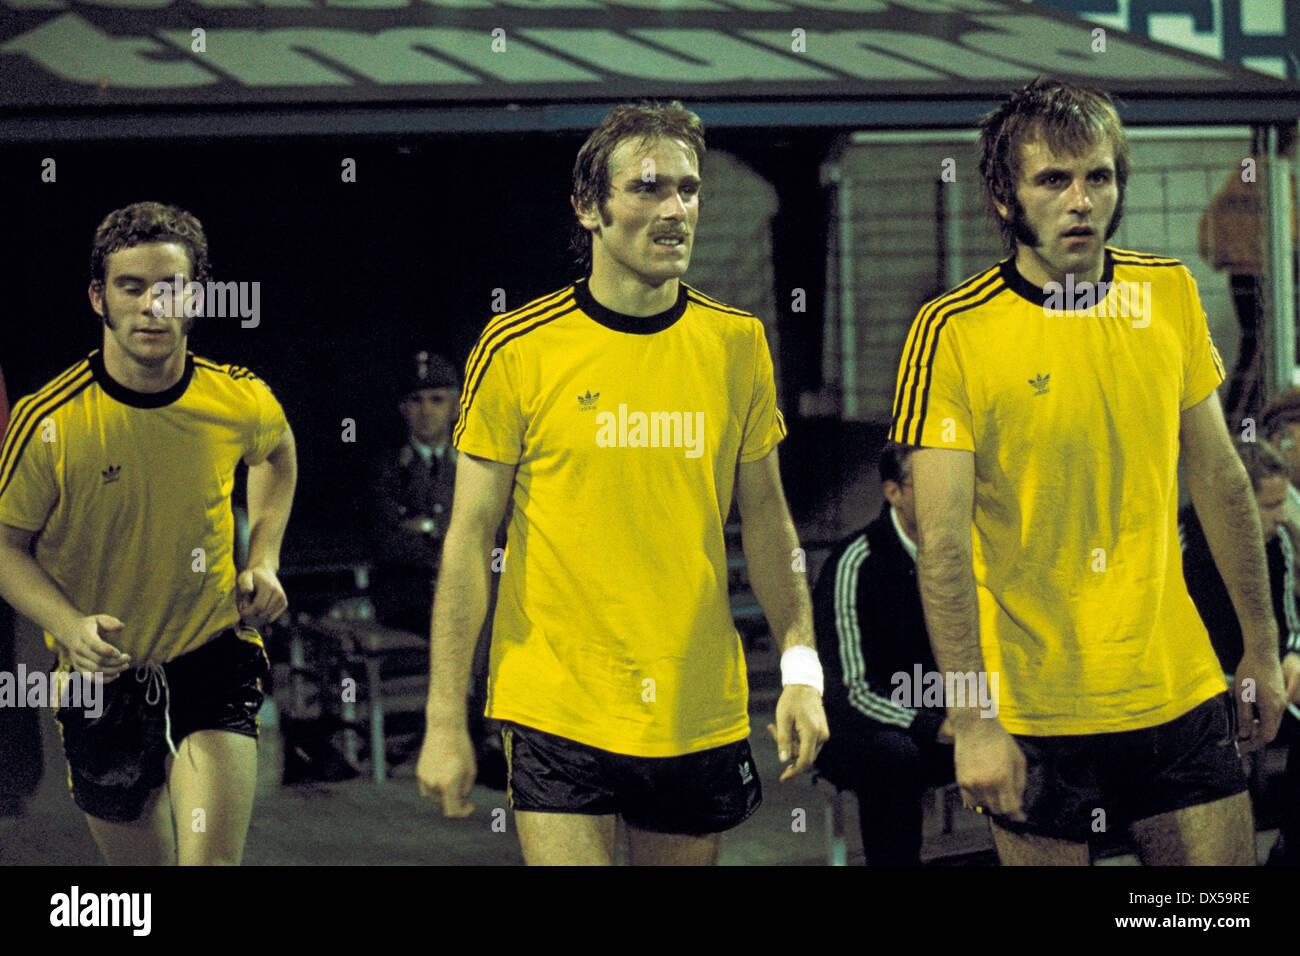 football, 2. Bundesliga Nord, 1974/1975, Westfalen Stadium, Borussia Dortmund versus Rot Weiss Oberhausen 4:0, running-in of Dortmund players to the second half, Hans-Gerd Schildt 2.f.l., Hans-Werner Hartl 3.f.l. - Stock Image